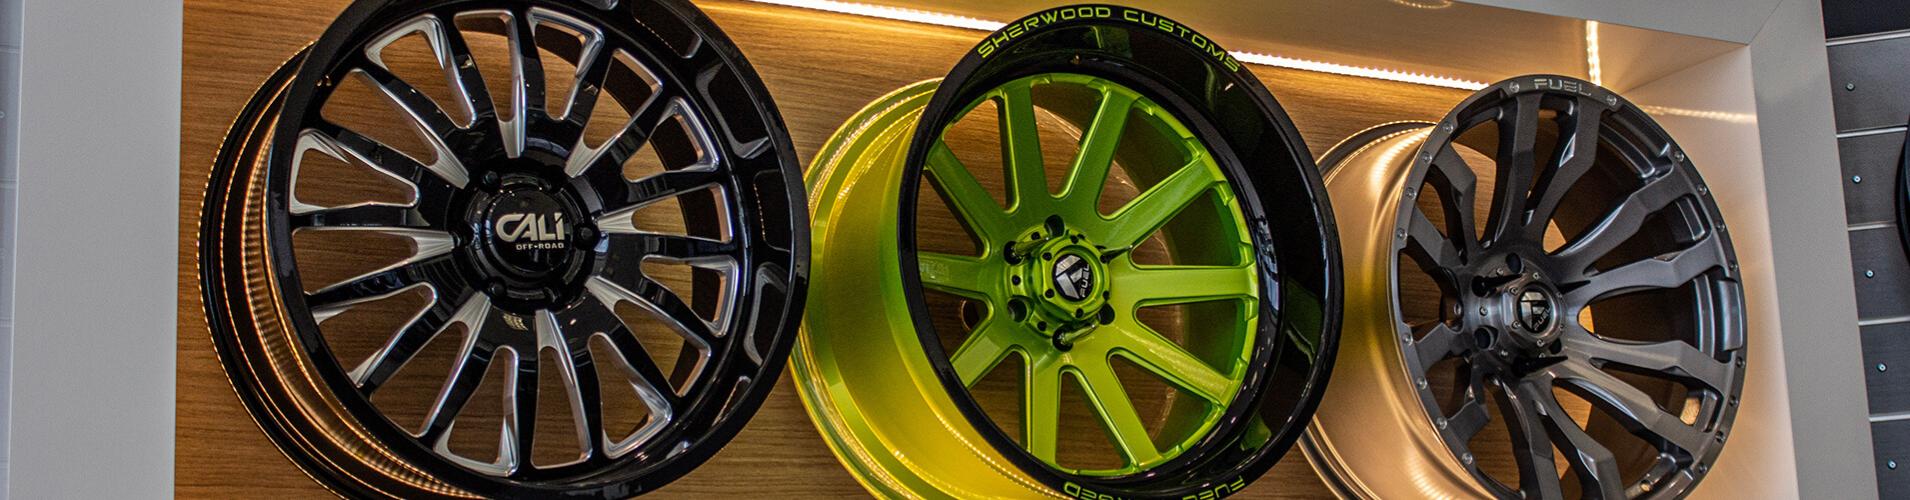 Sherwood Customs Wheel Wall